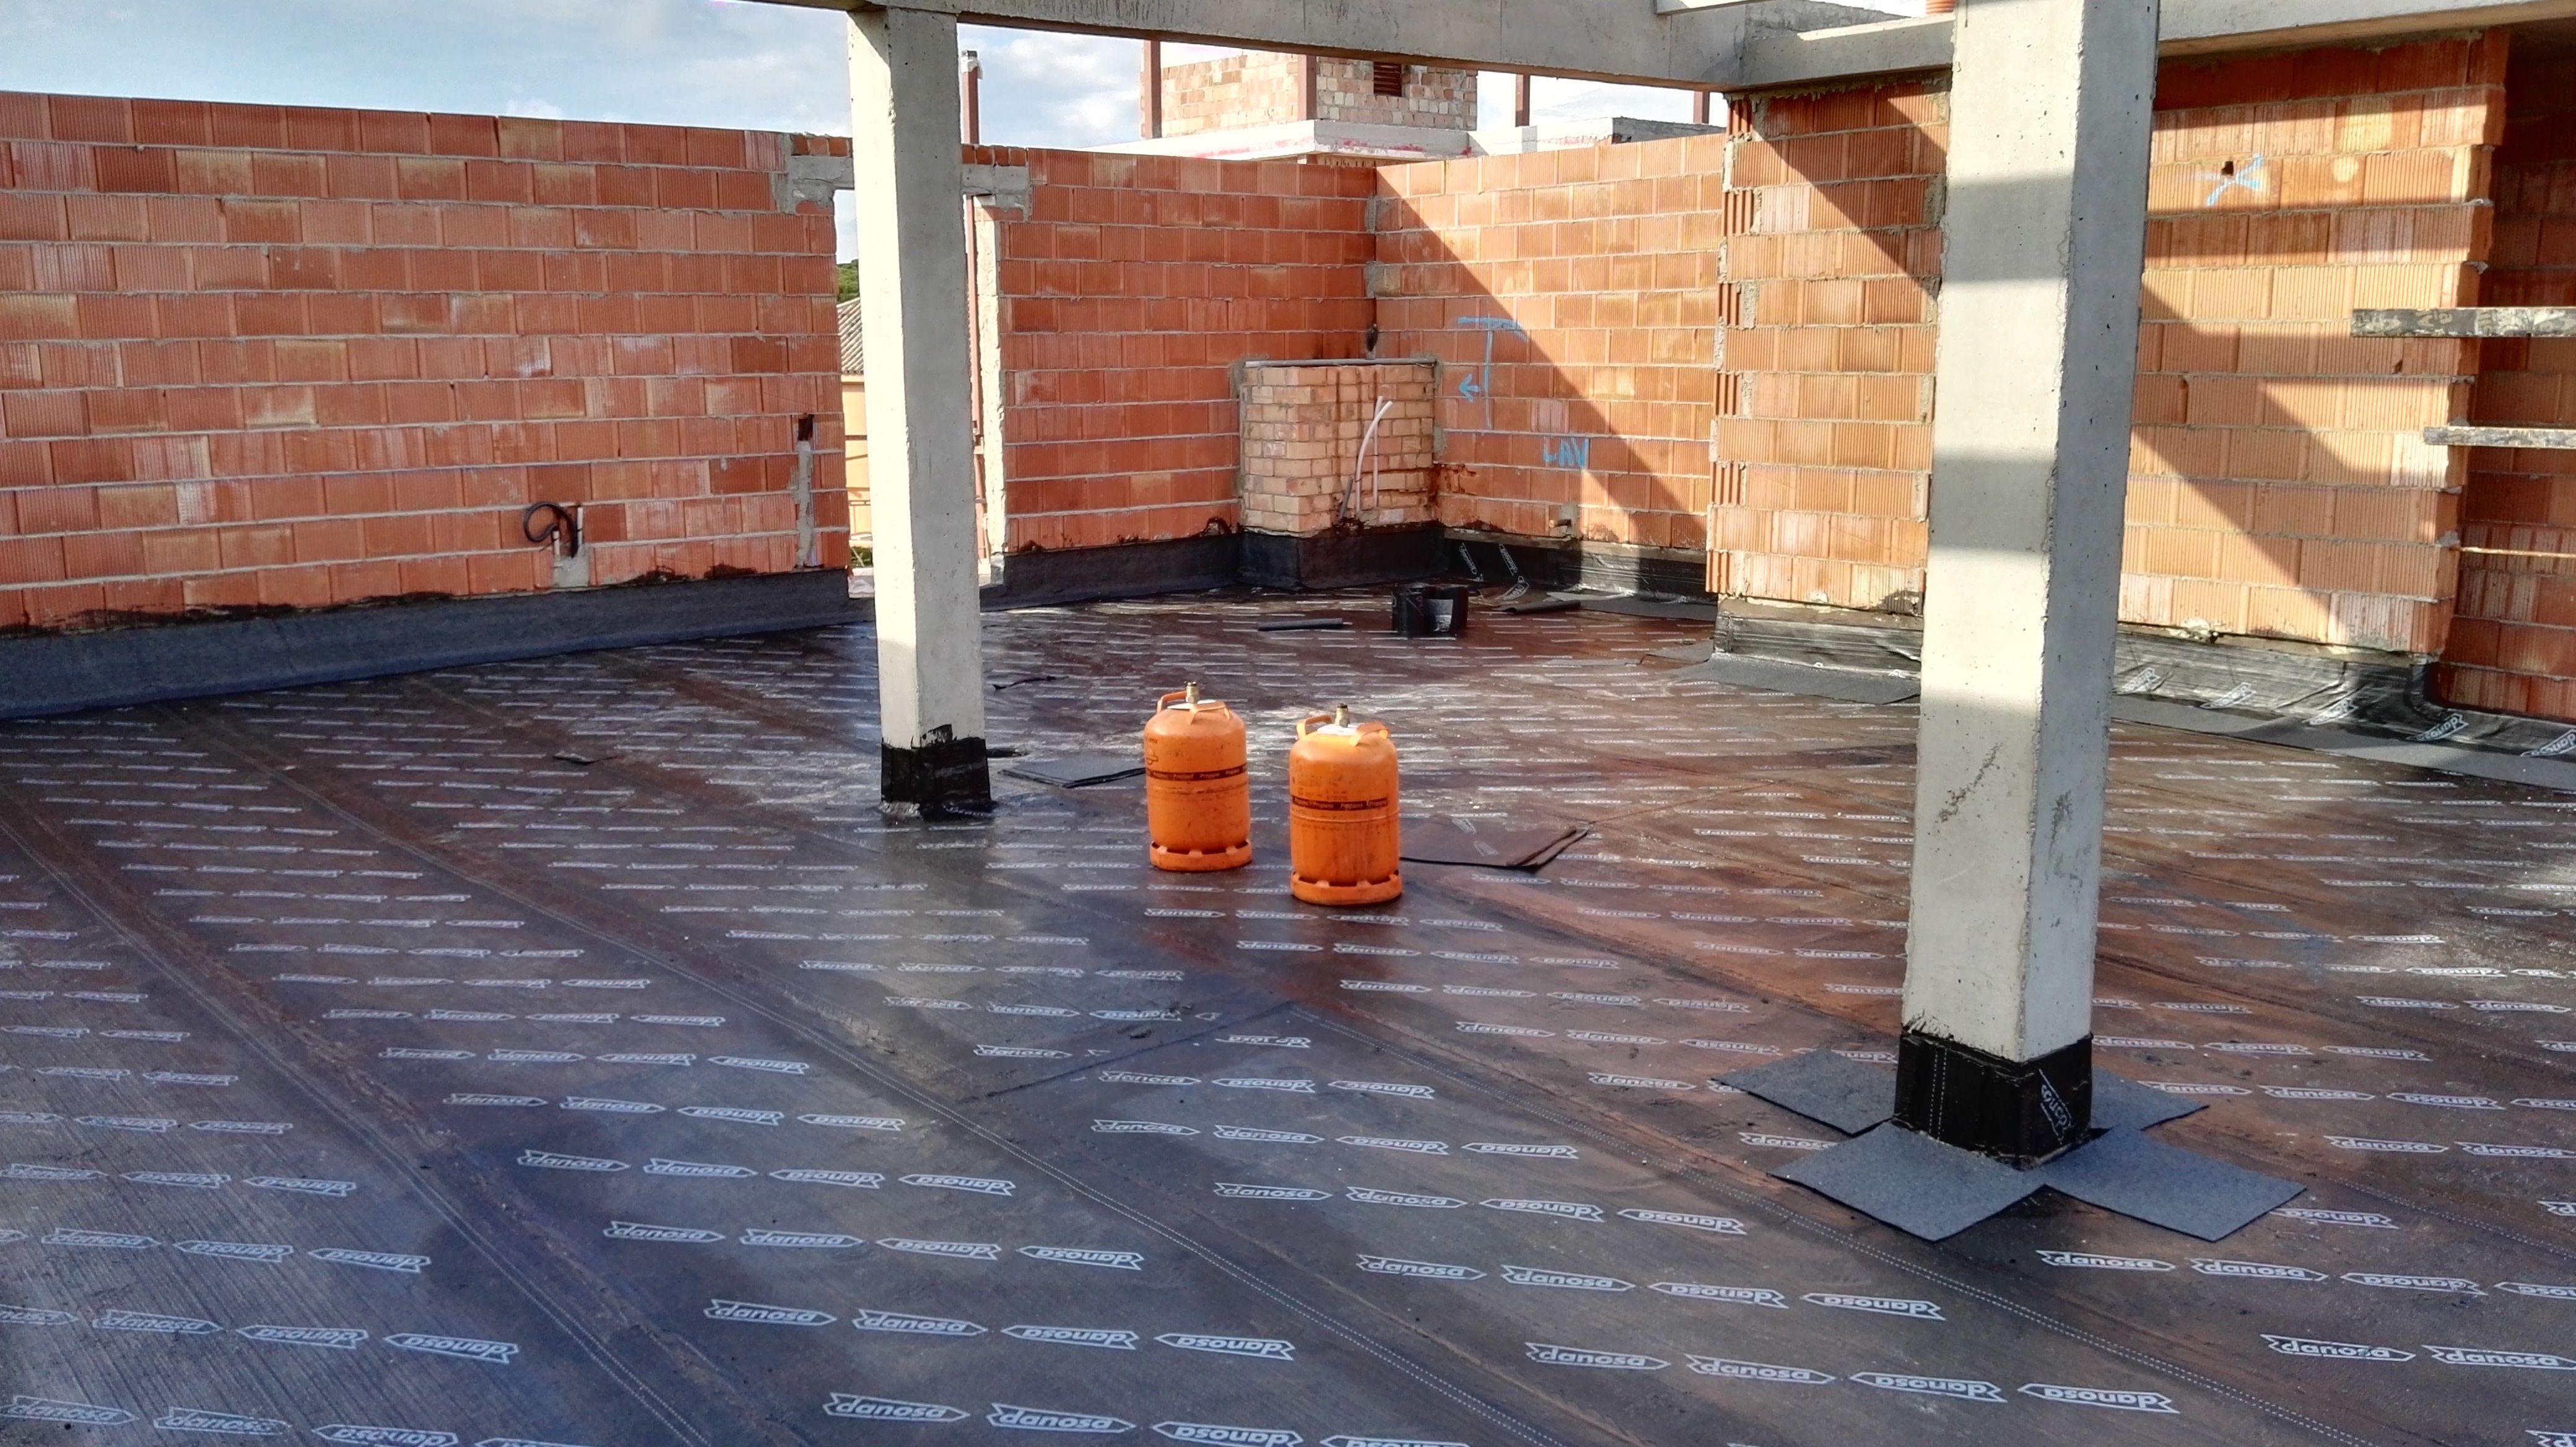 Rehabilitación de cubiertas en Mérida